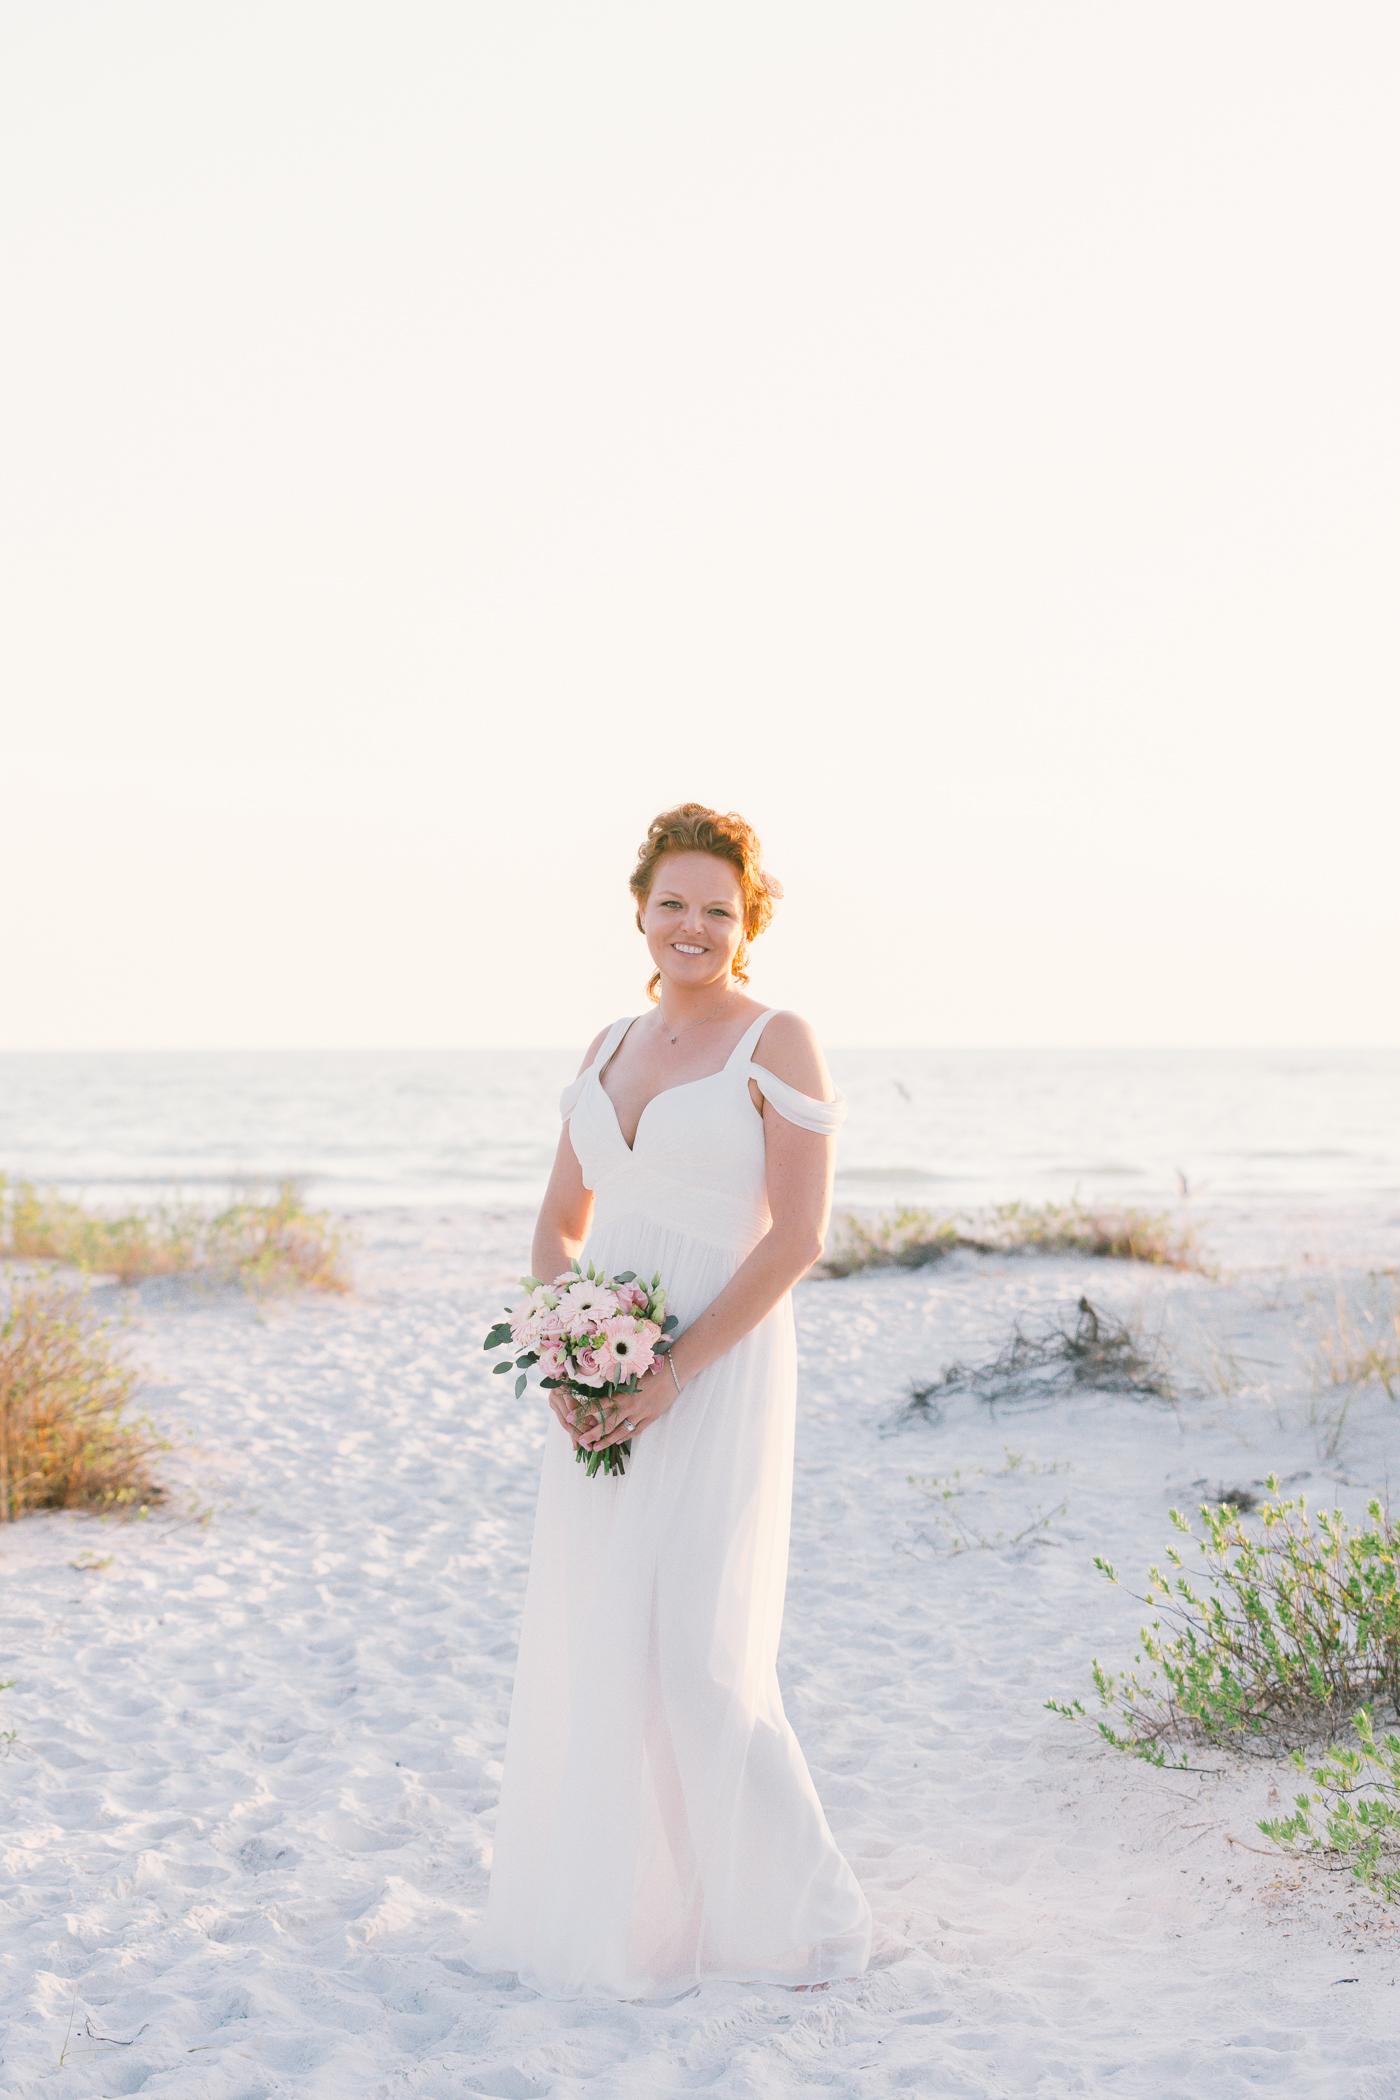 Sarasota-beach-wedding-photography, bride-wedding-photo, Florida-beach-wedding